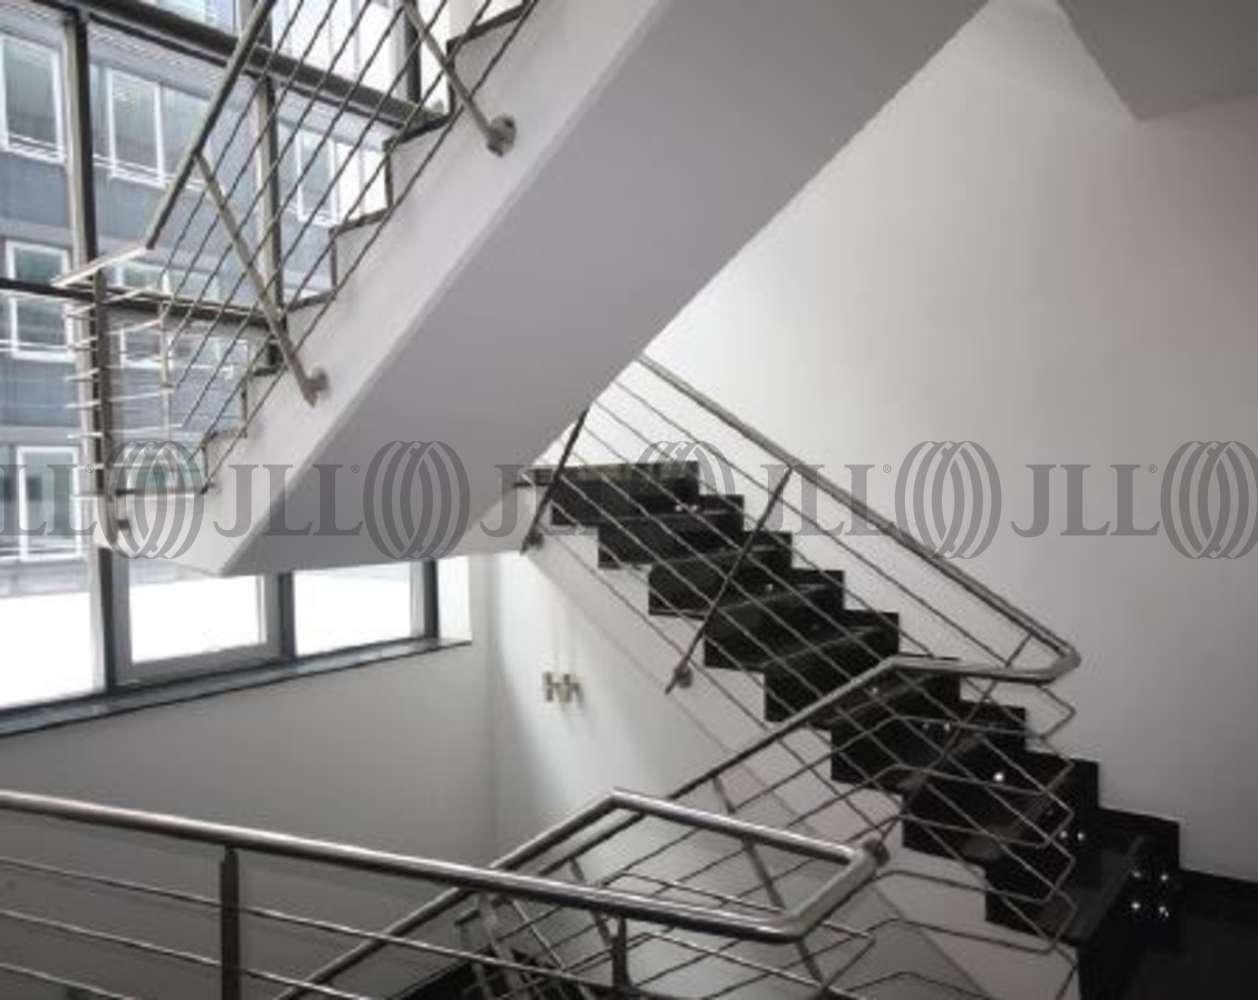 Büros Bielefeld, 33604 - Büro - Bielefeld, Sieker - H1083 - 9410136